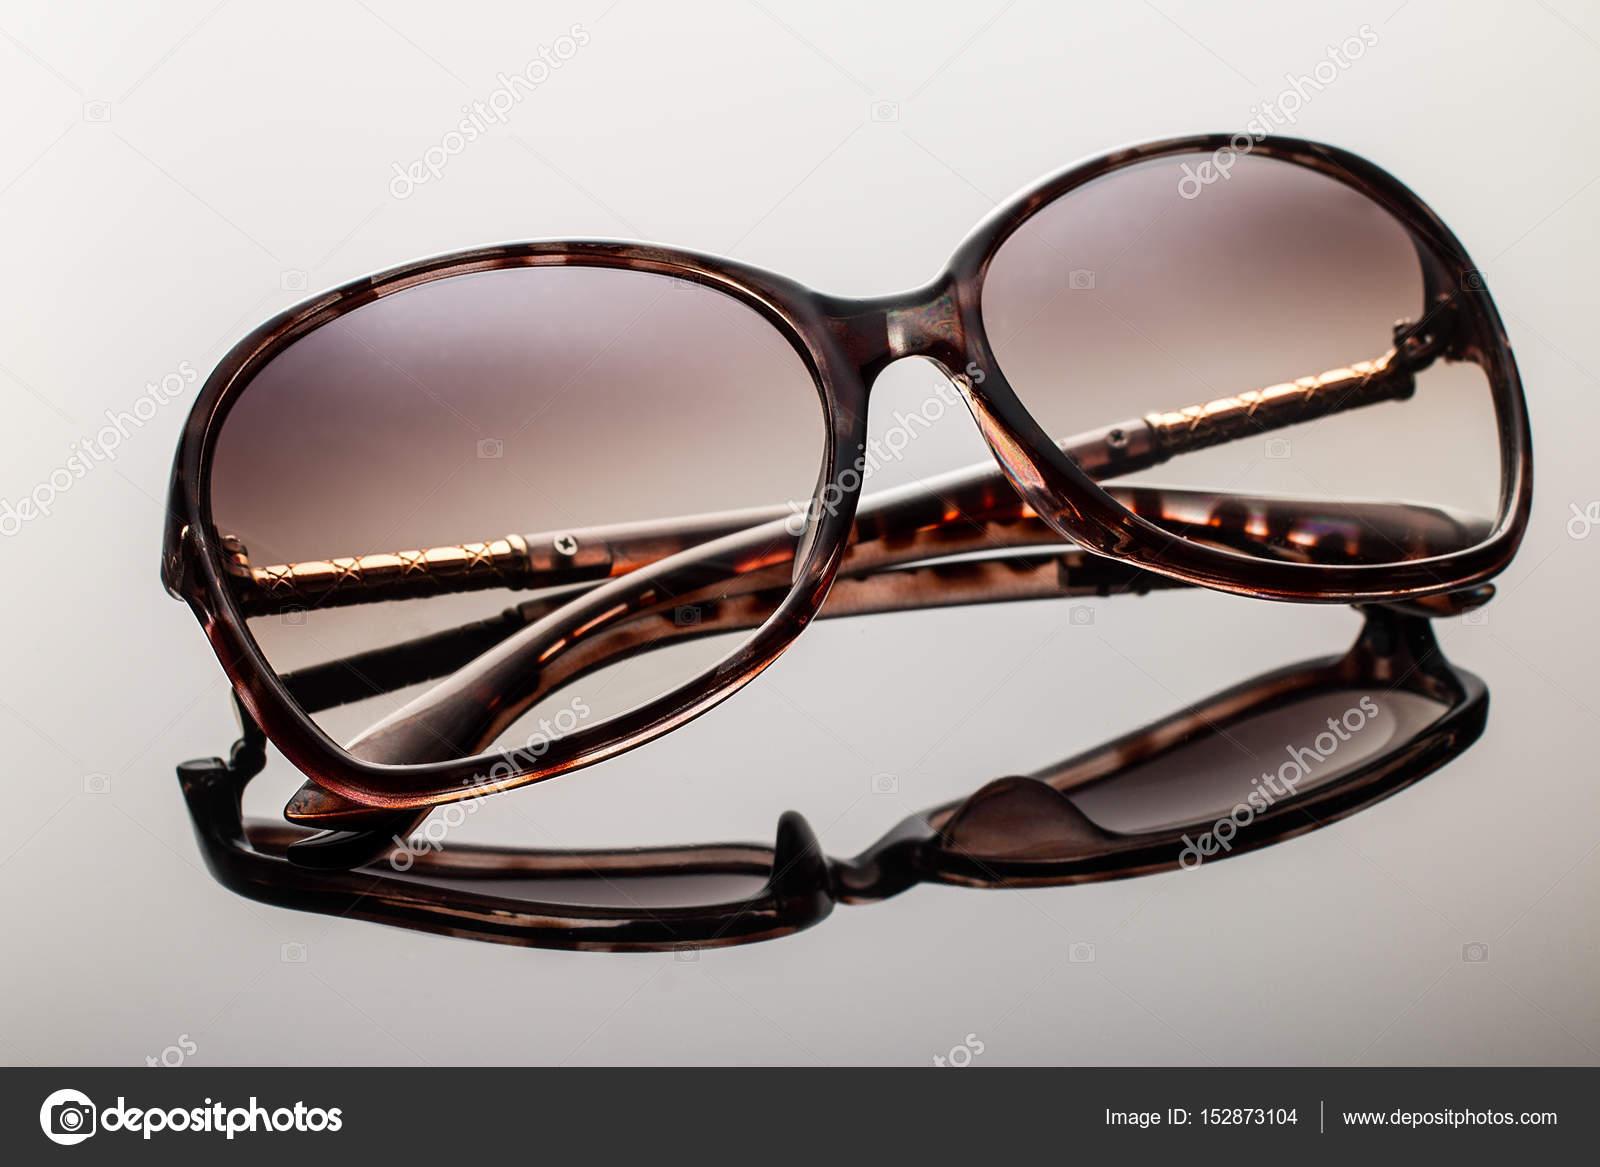 f1d5334c783f7 óculos de sol elegantes em fundo preto — Fotografias de Stock ...